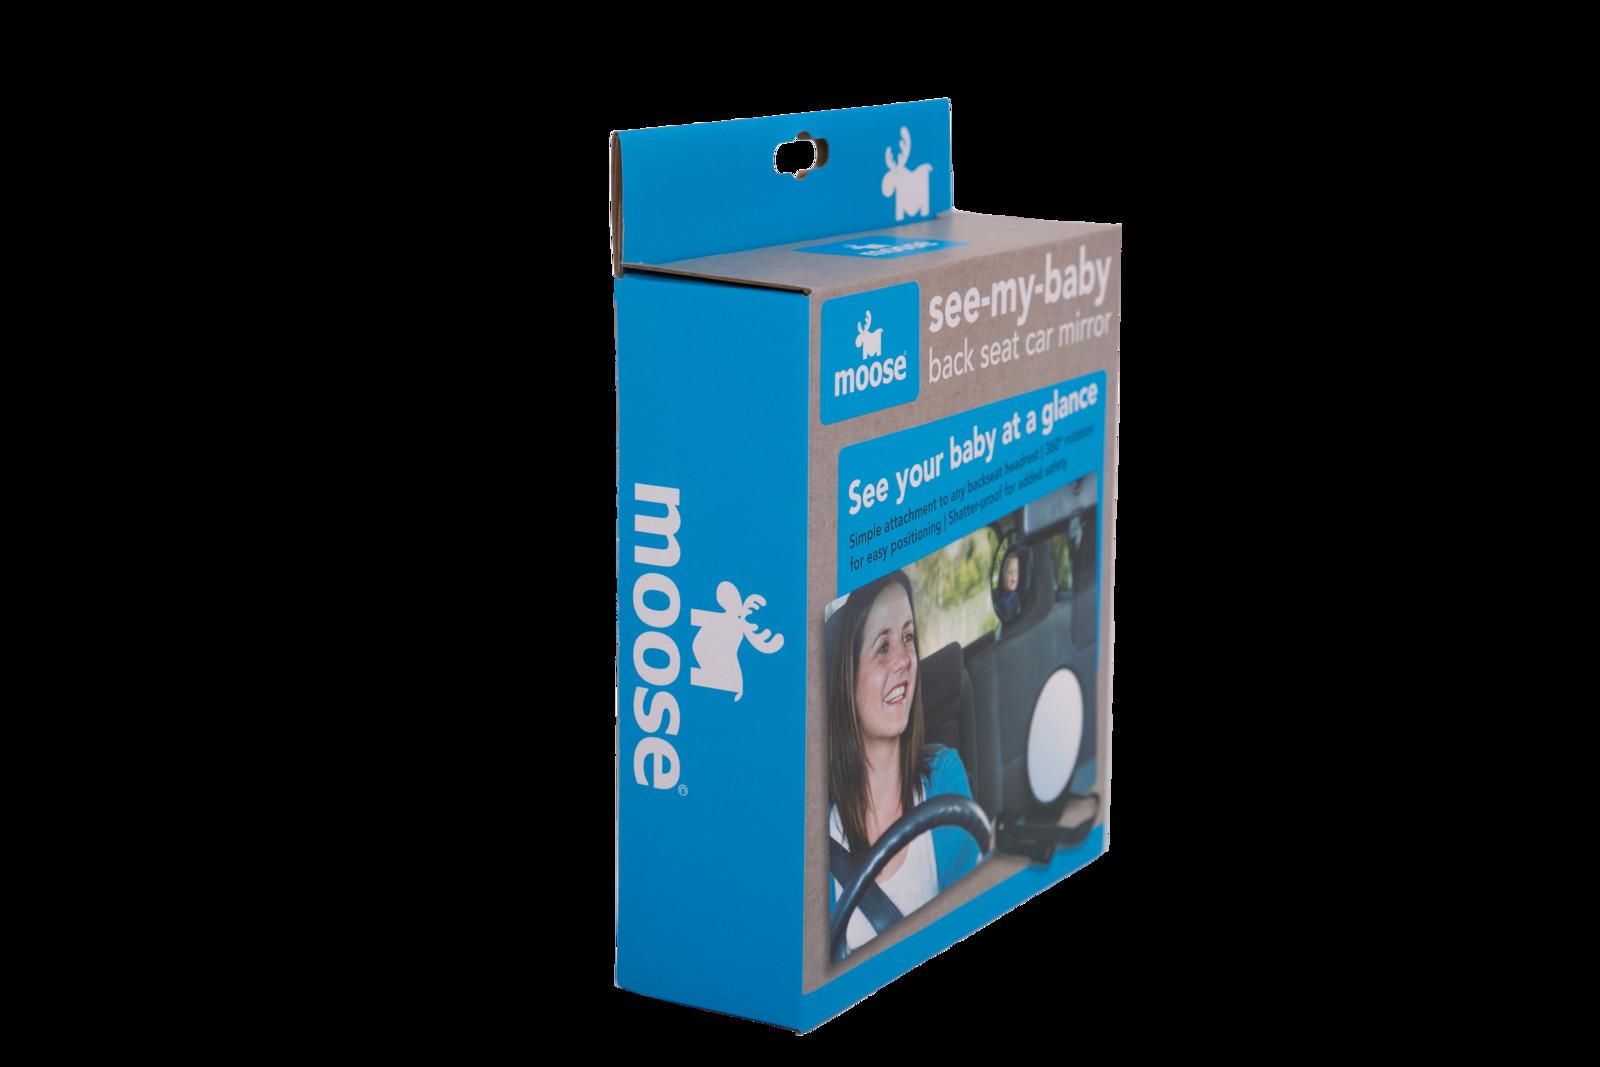 Moose See-My-Baby Back Seat Car Mirror image